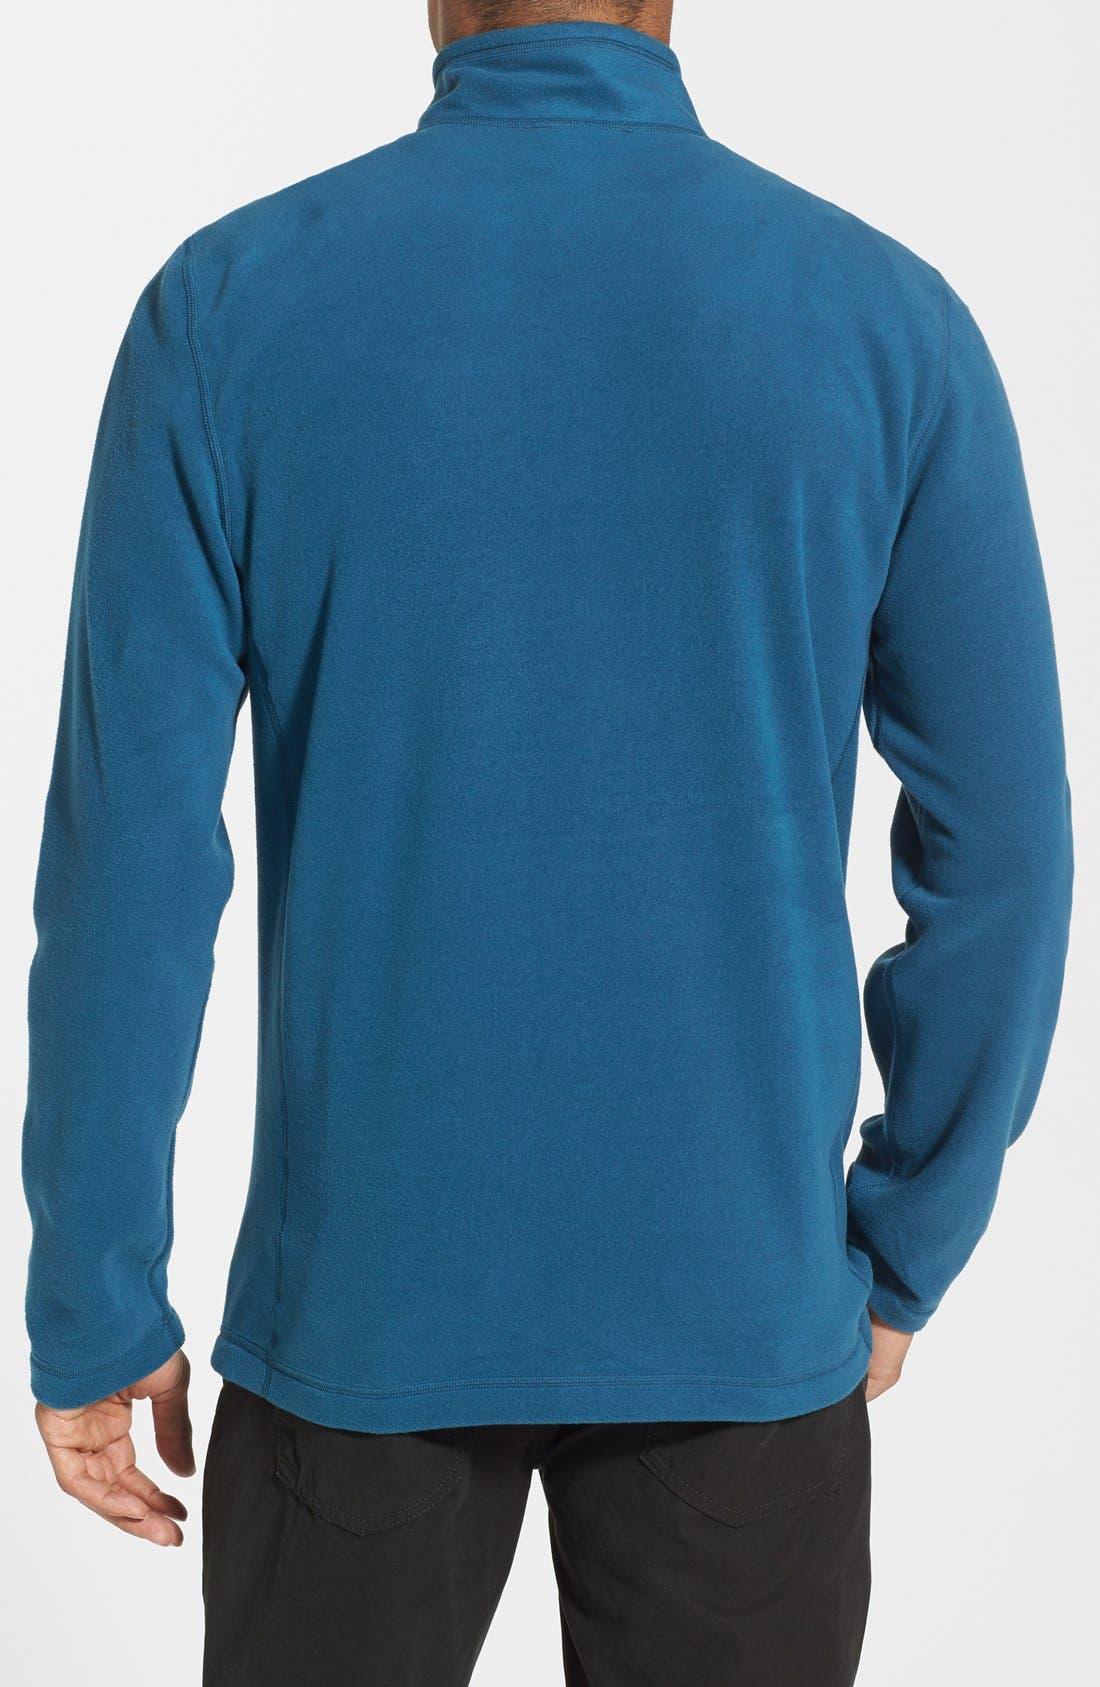 'TKA 100 Glacier' Quarter Zip Fleece Pullover,                             Alternate thumbnail 123, color,